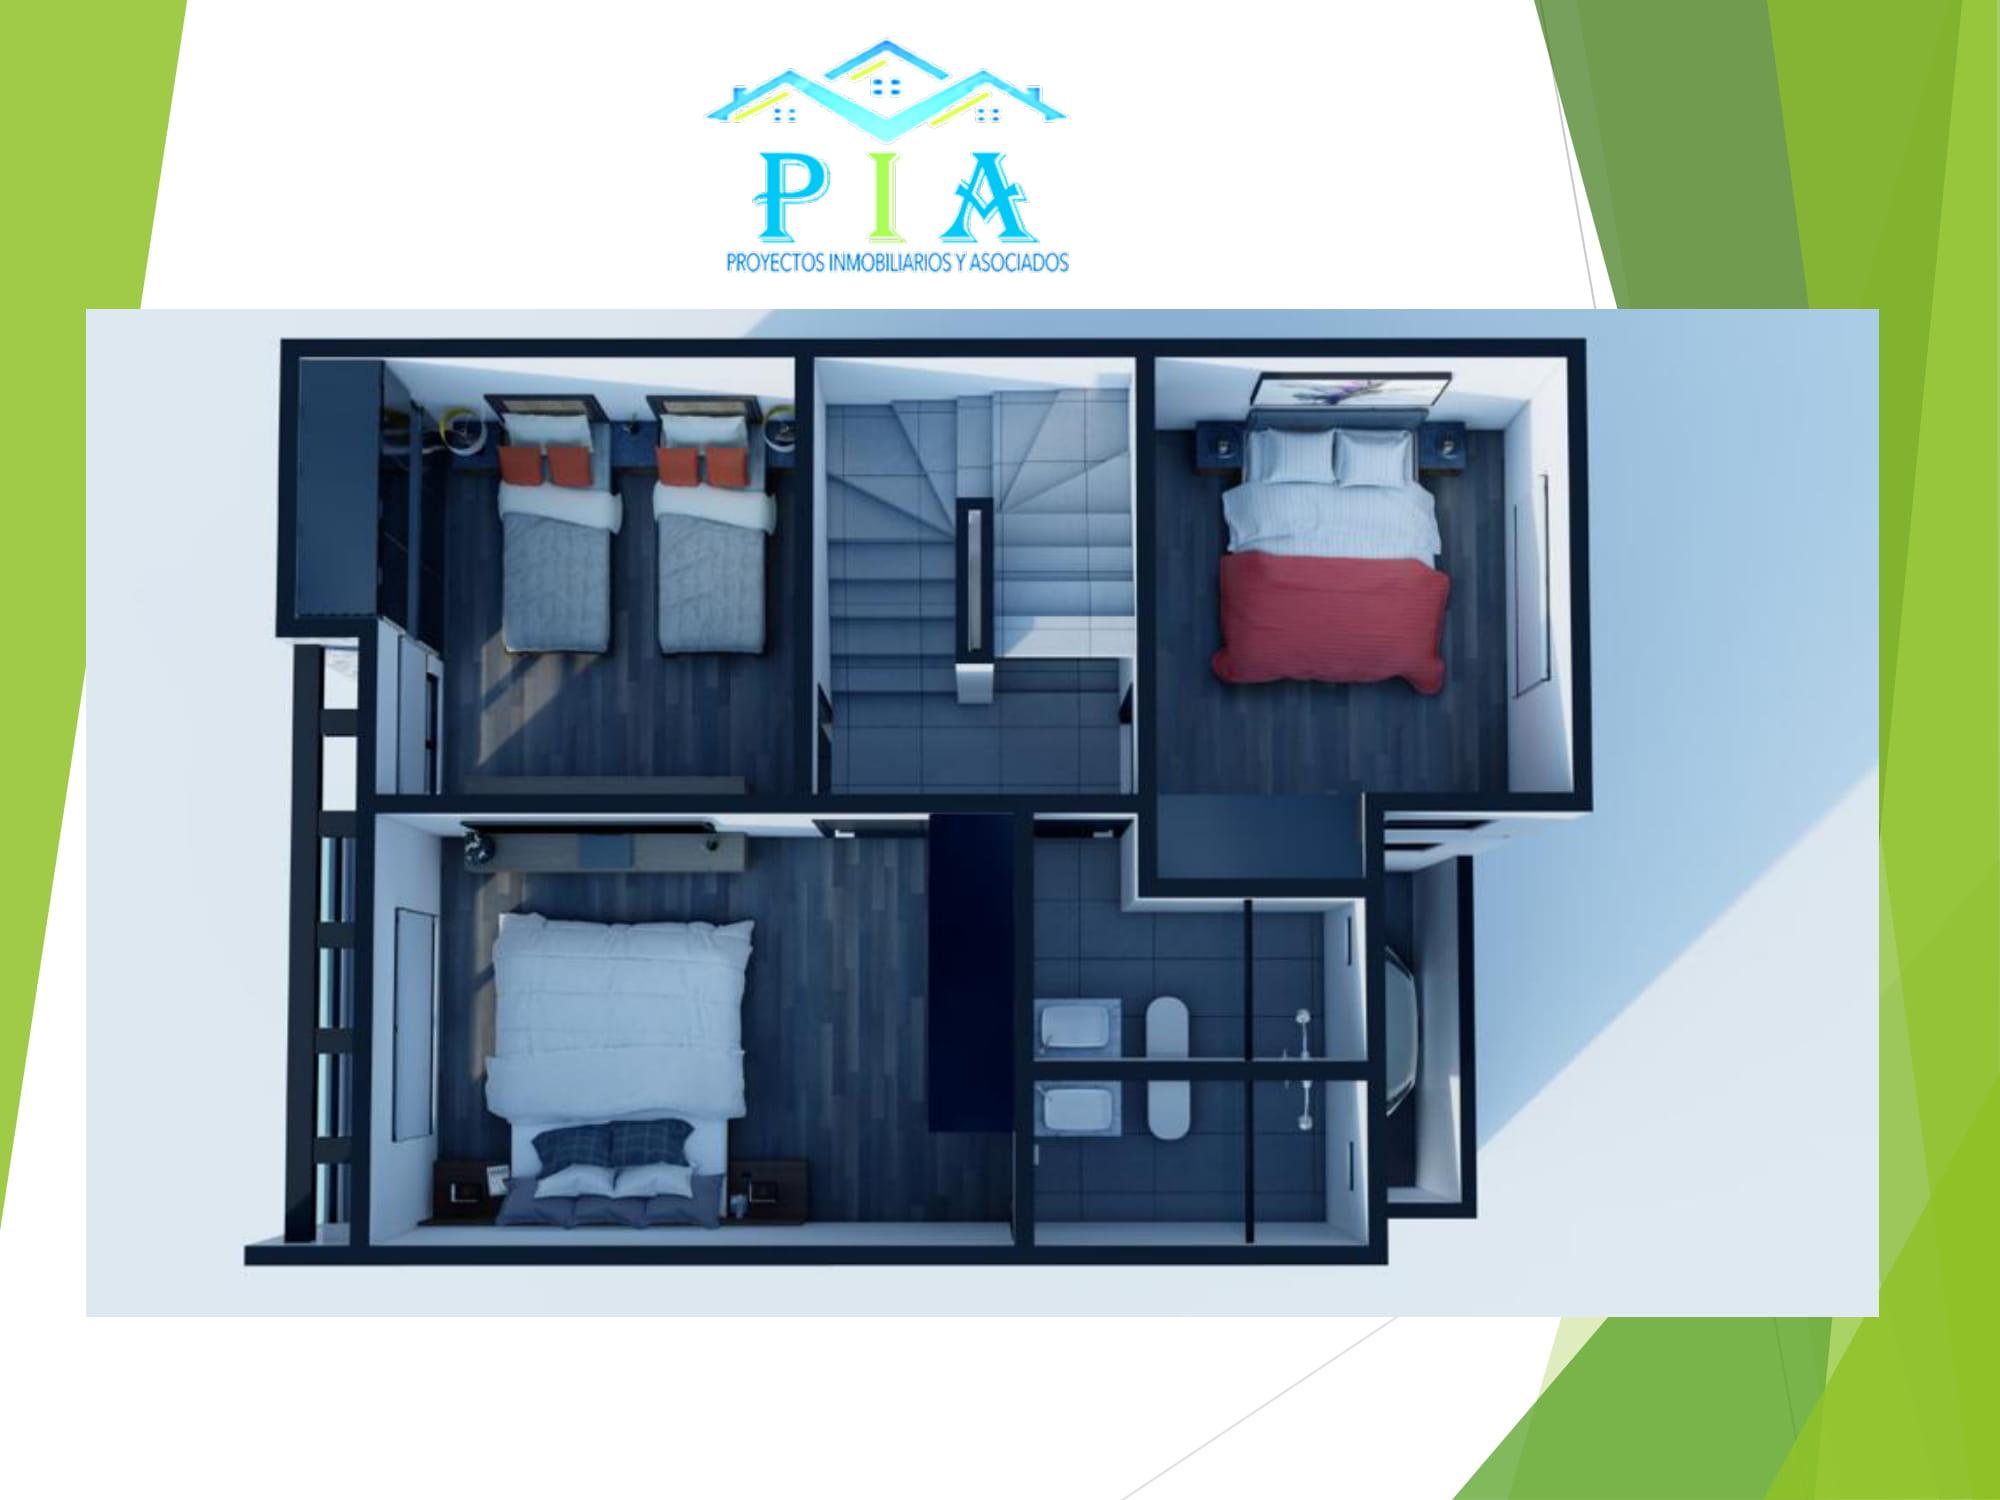 https://0201.nccdn.net/1_2/000/000/184/e5c/venta-residencial-teya-4.jpg